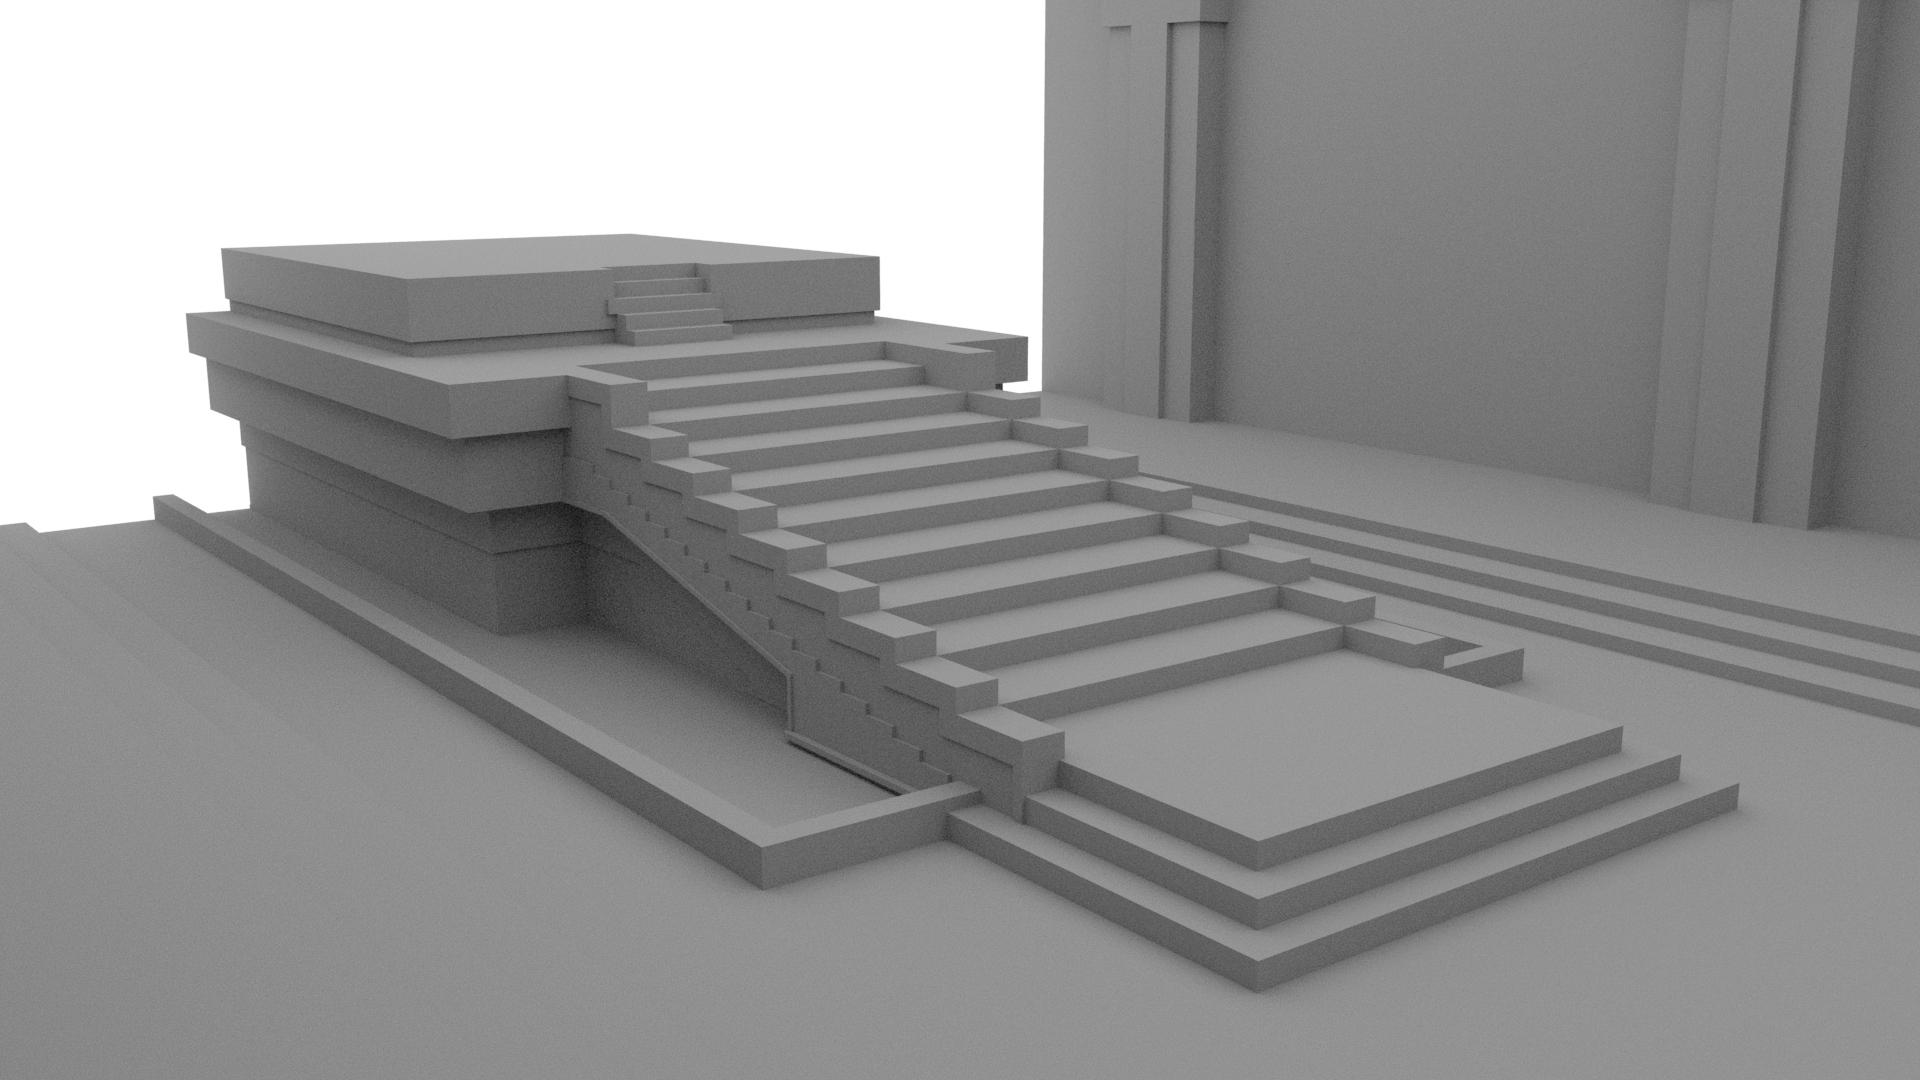 Meereen Throne Room WIP